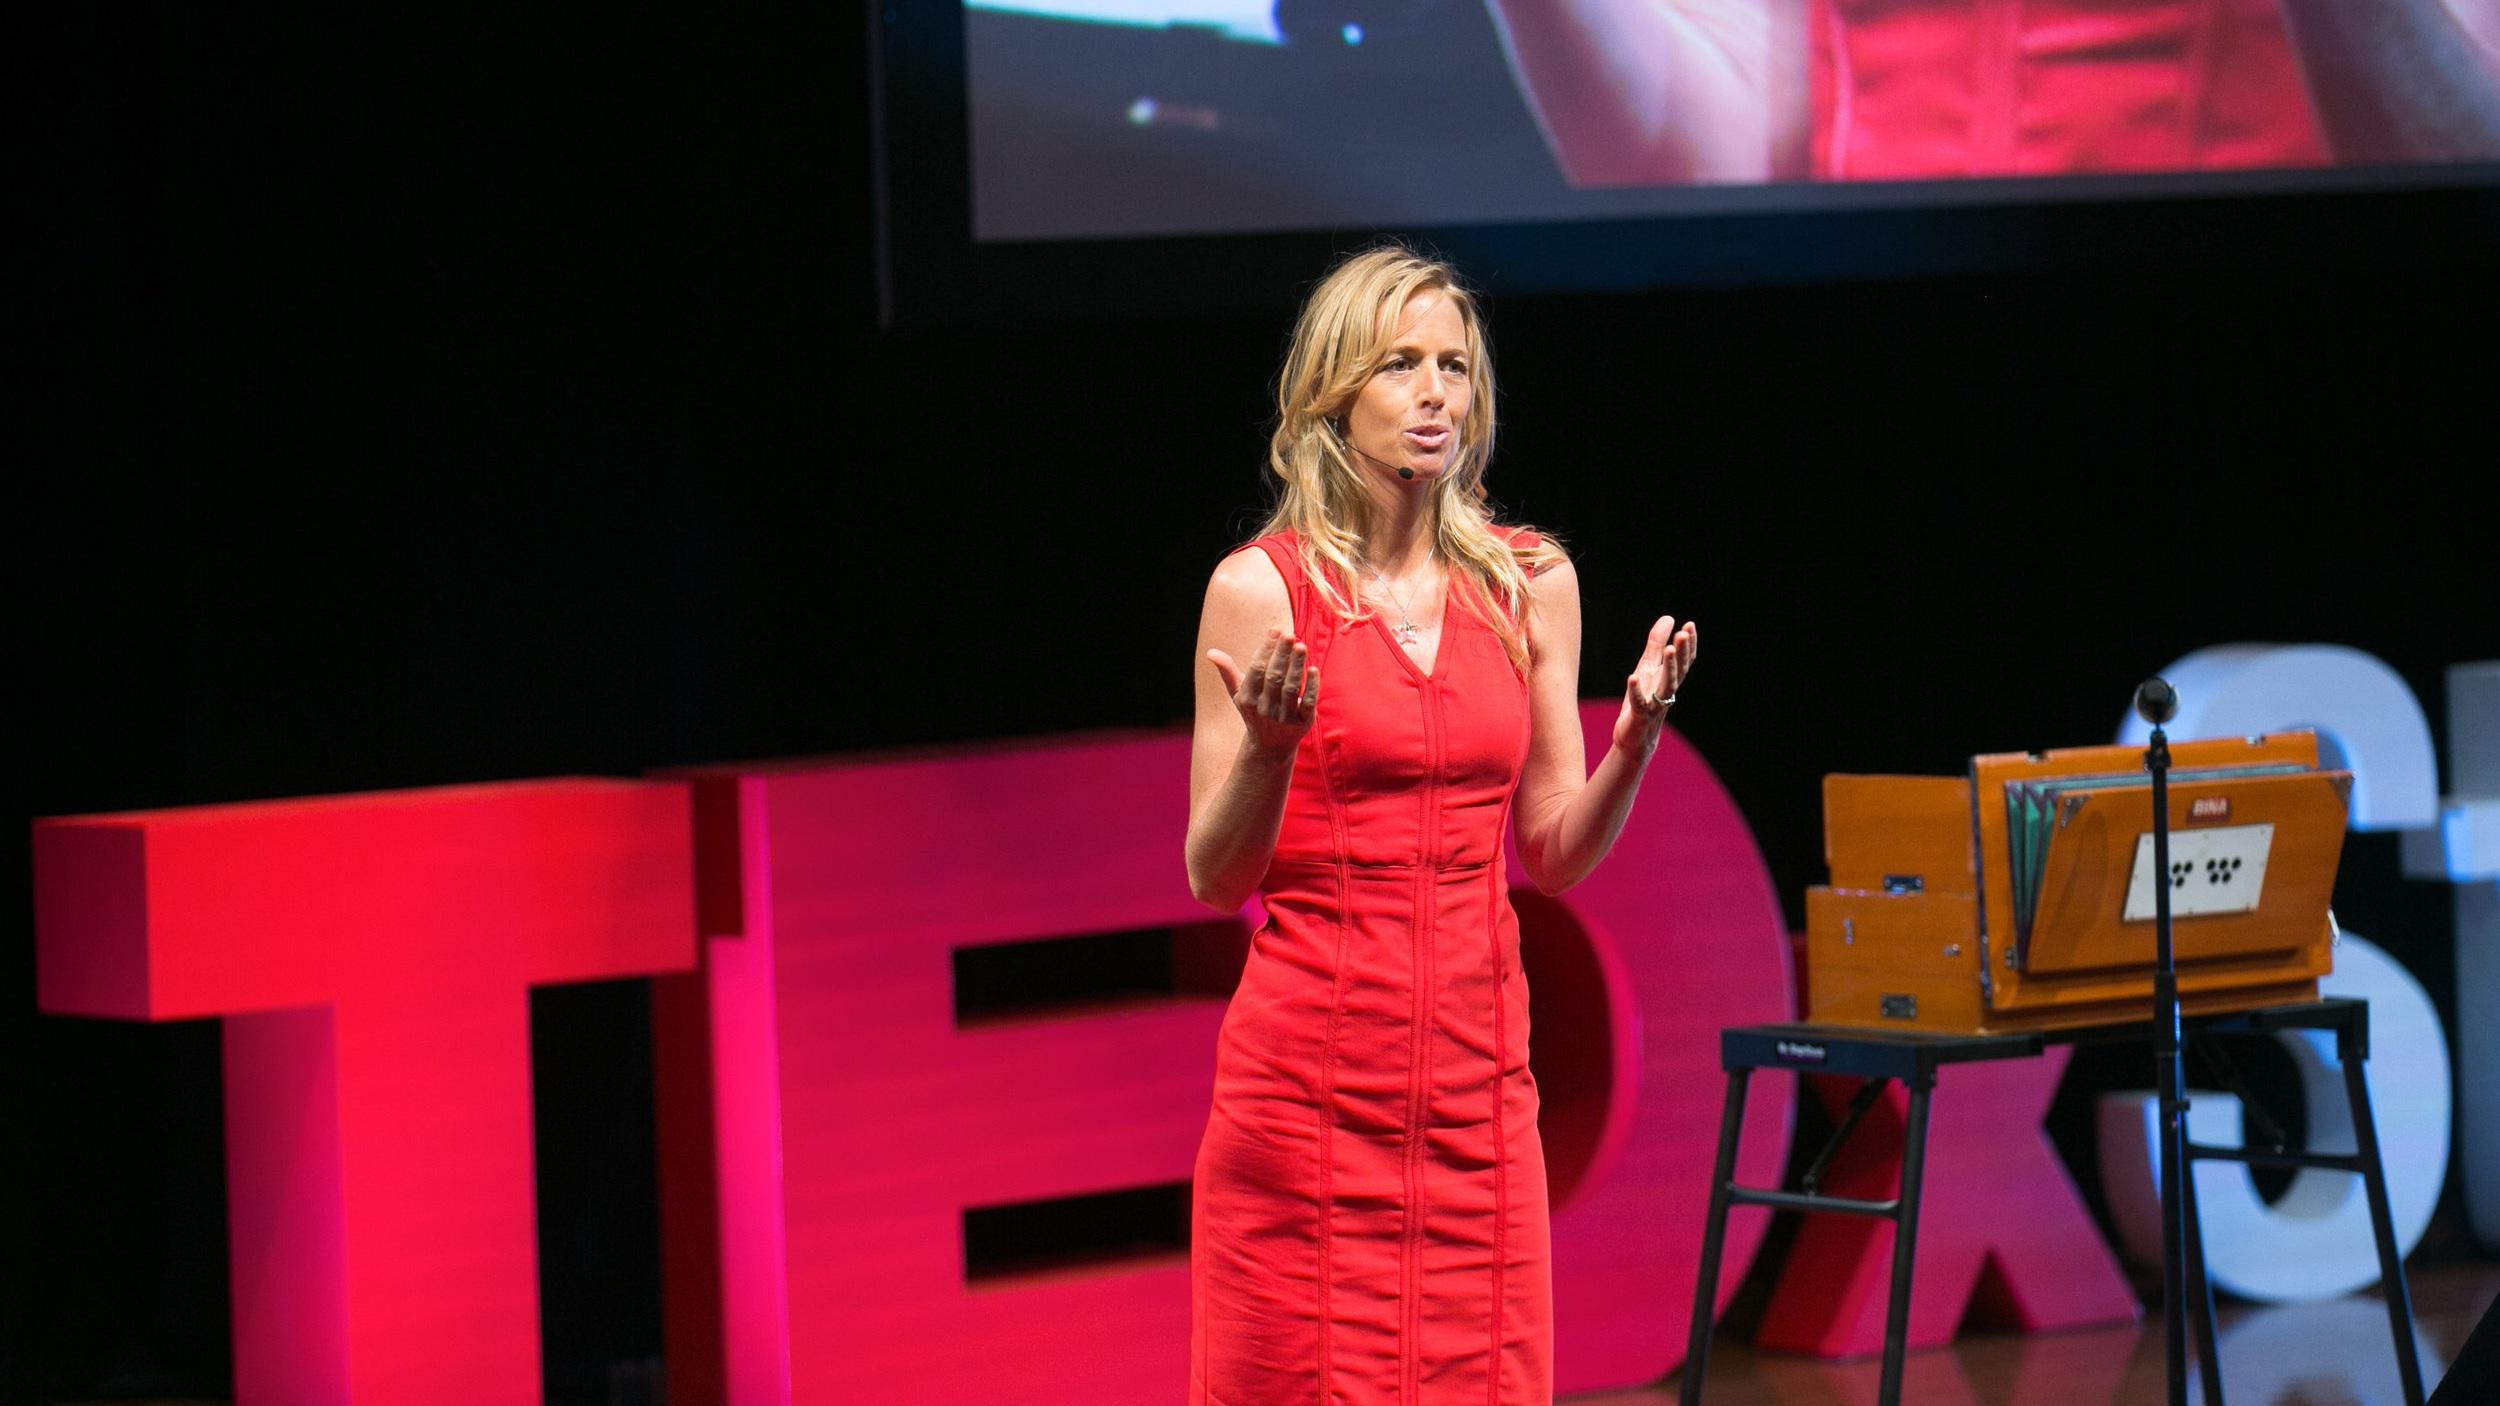 Tabby+Biddle_TEDxStMarksSchool.jpg